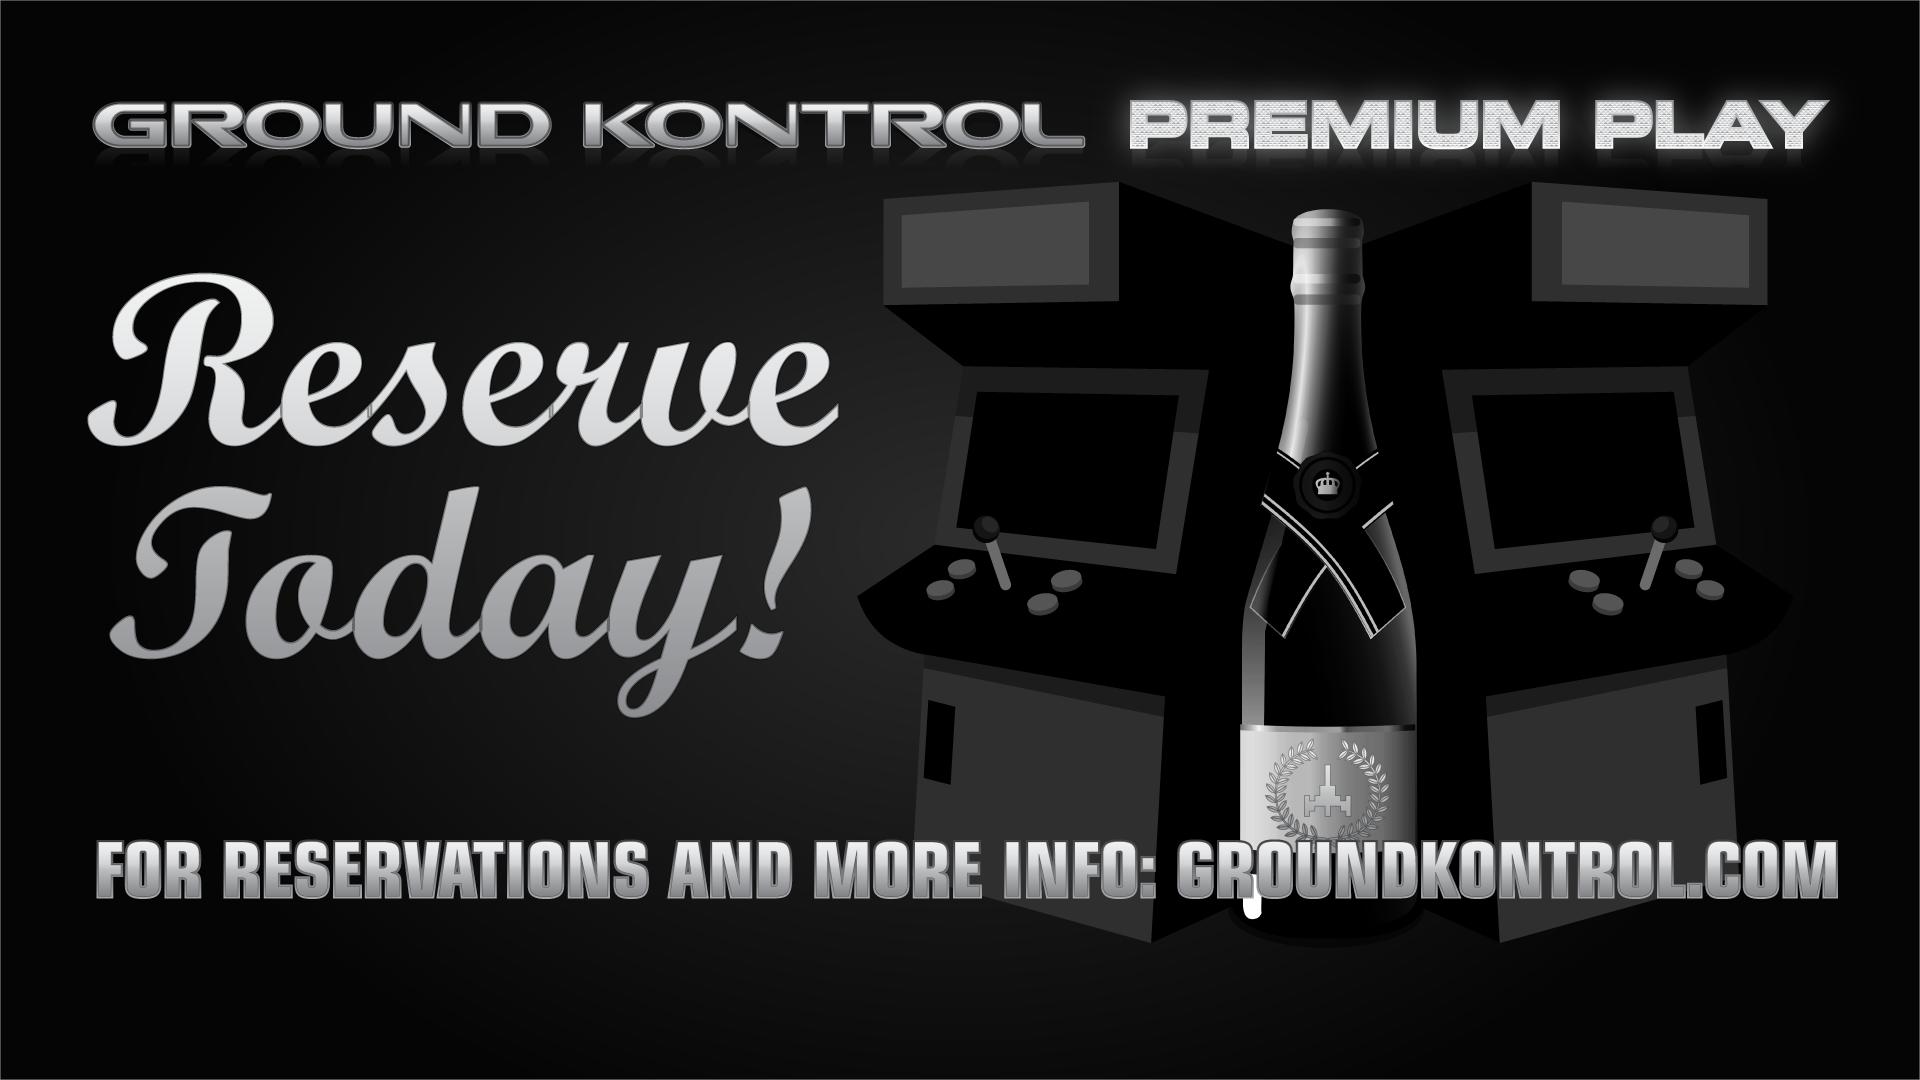 Introducing Ground Kontrol Premium Play!